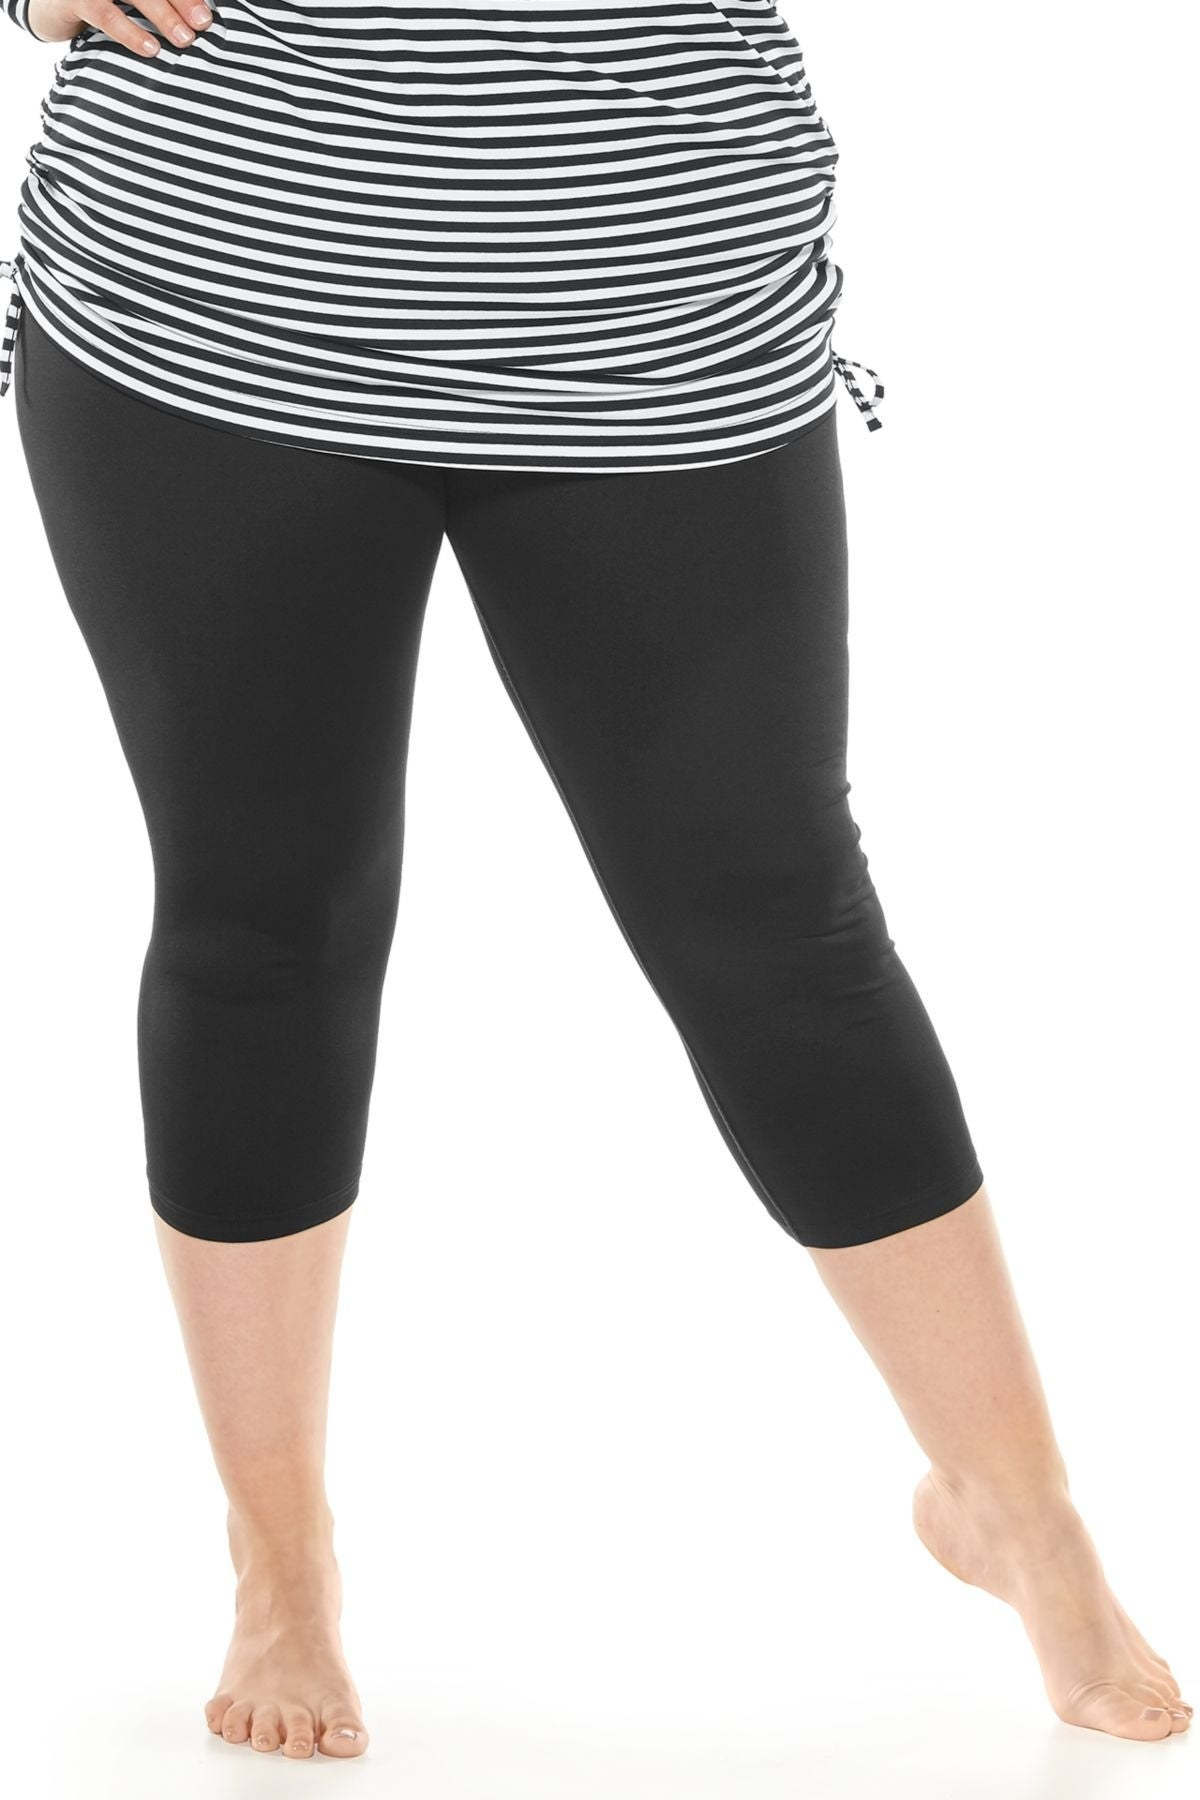 model in black mid-calf leggings